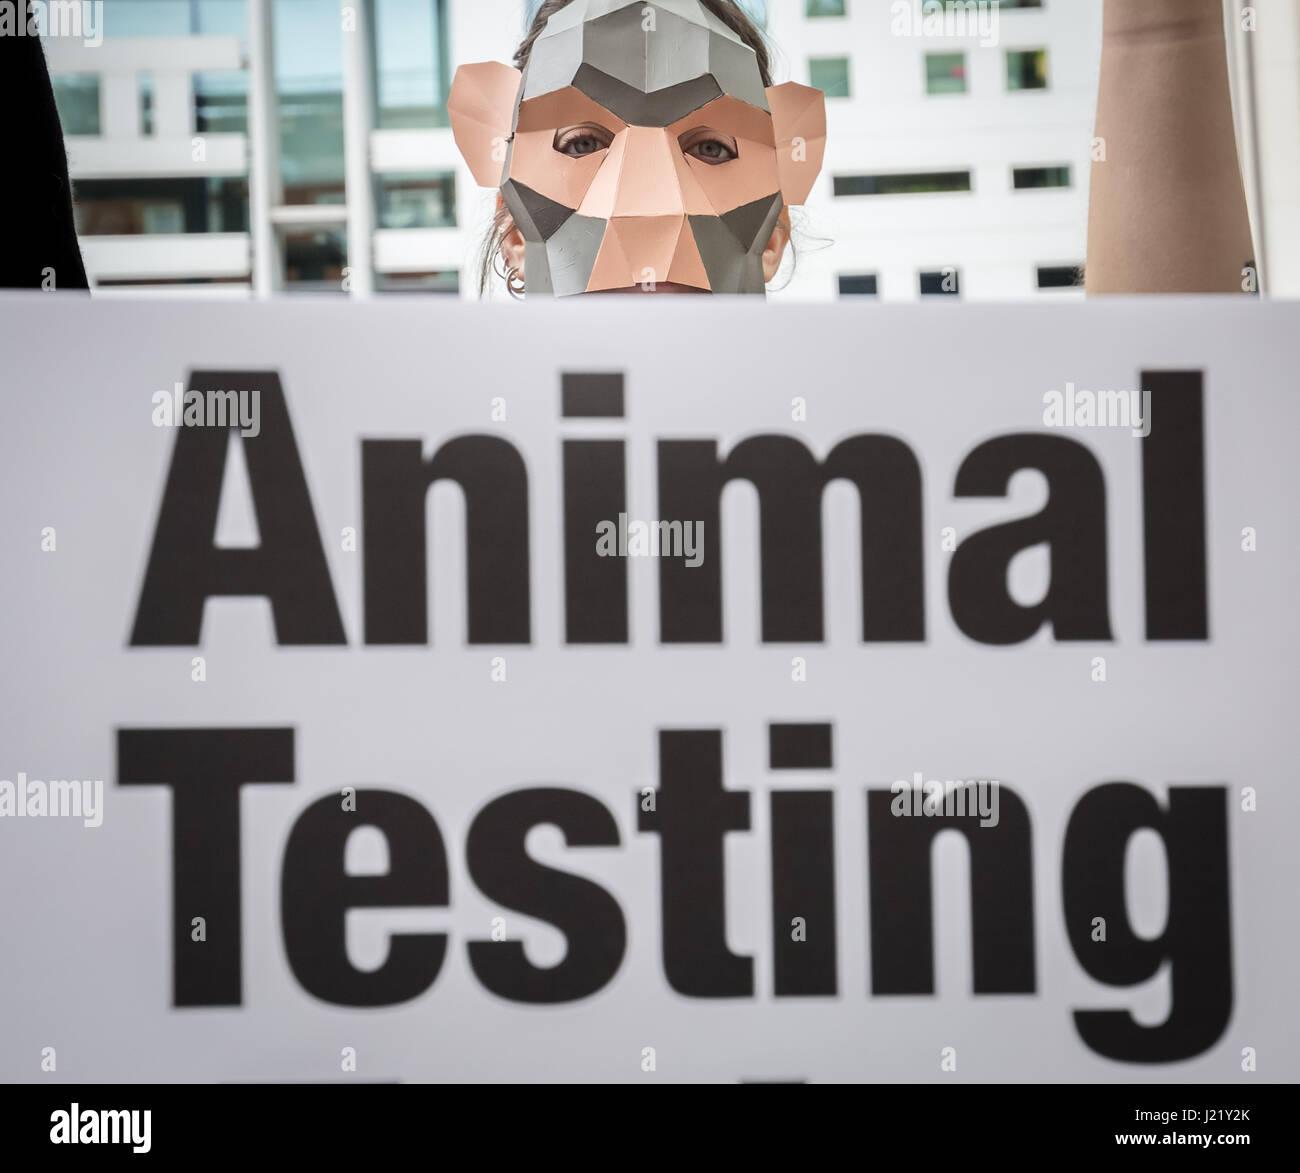 Animal Testing Protest Stock Photos & Animal Testing Protest Stock ...